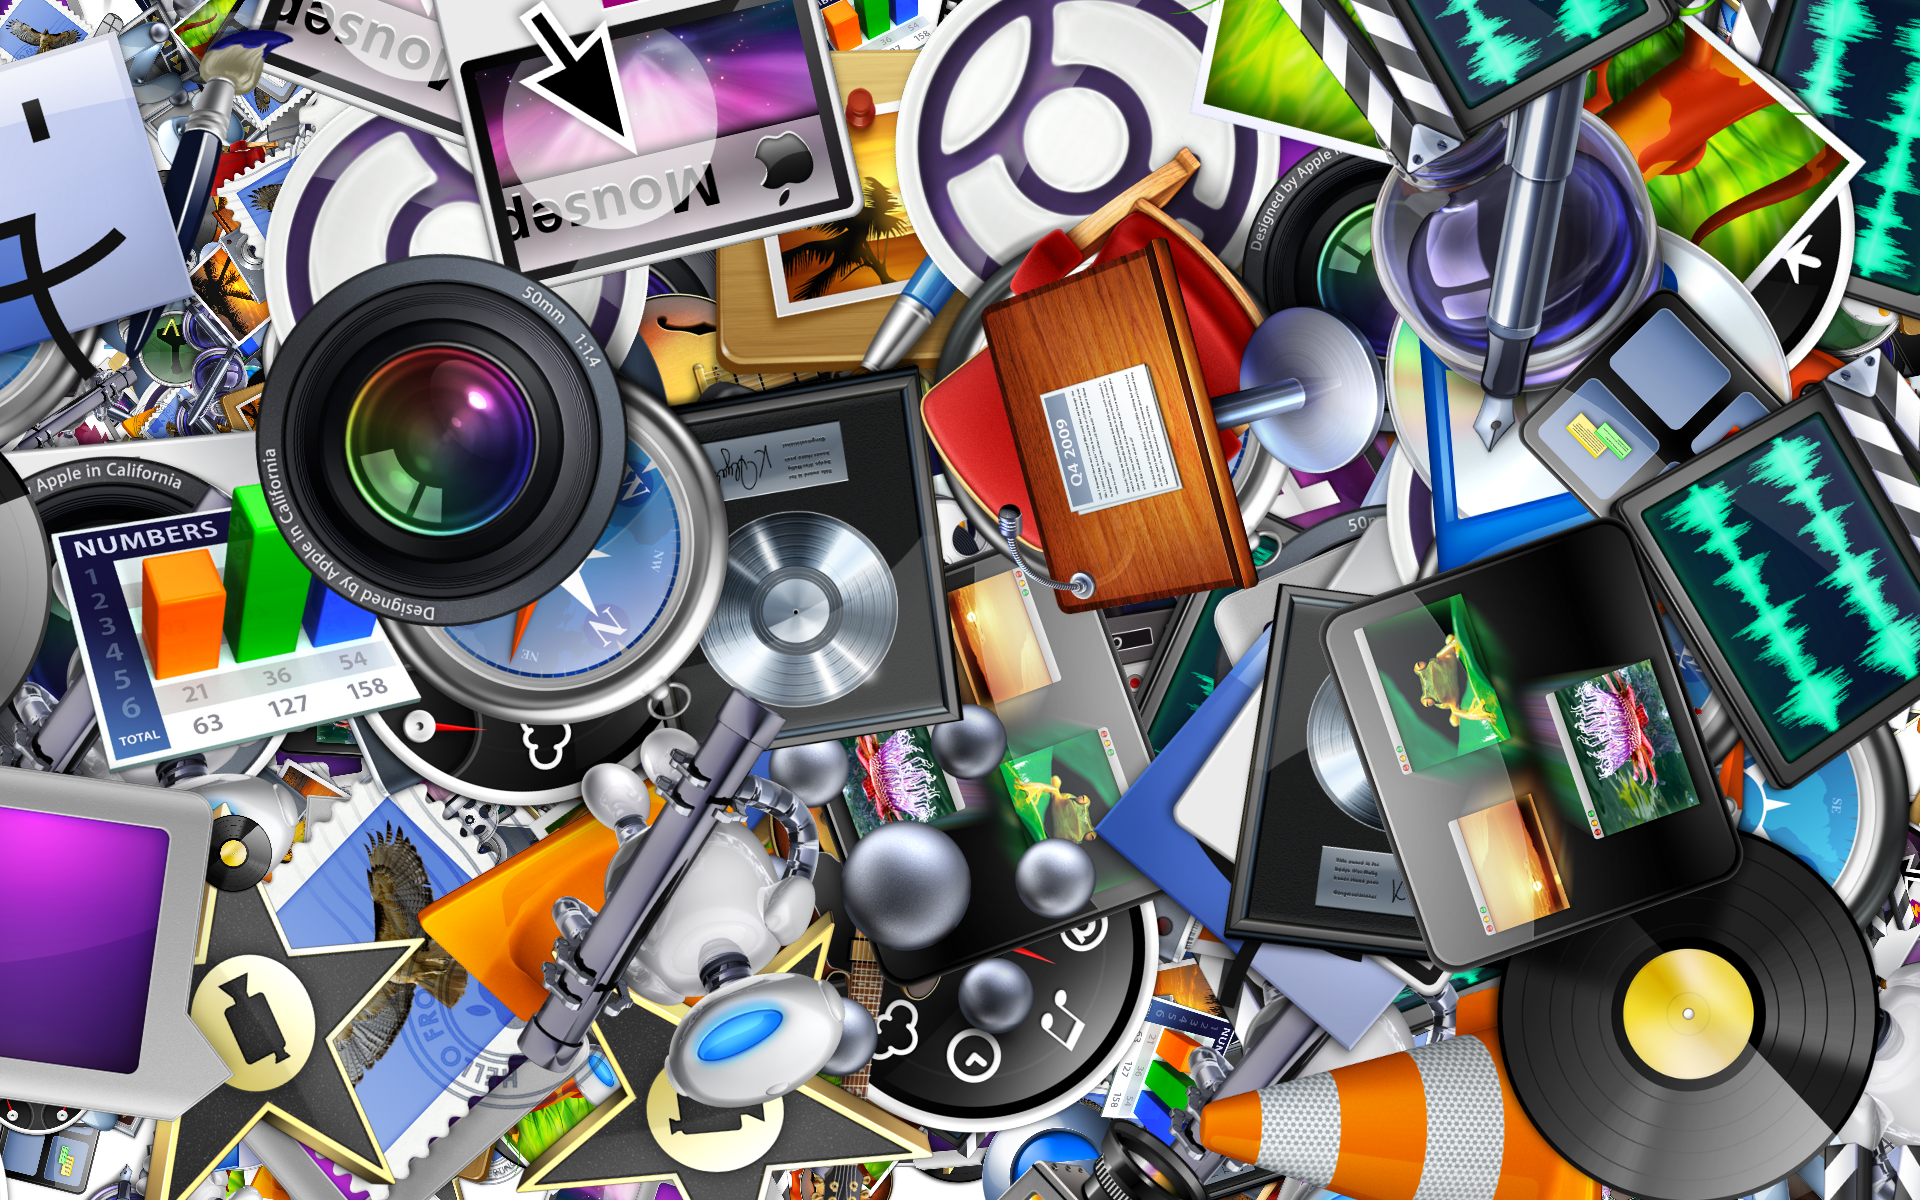 Hd wallpaper app - Wallpaper Downloader App For Pc Hd Wallpaper App Download Apple Logo Wallpapers Hd